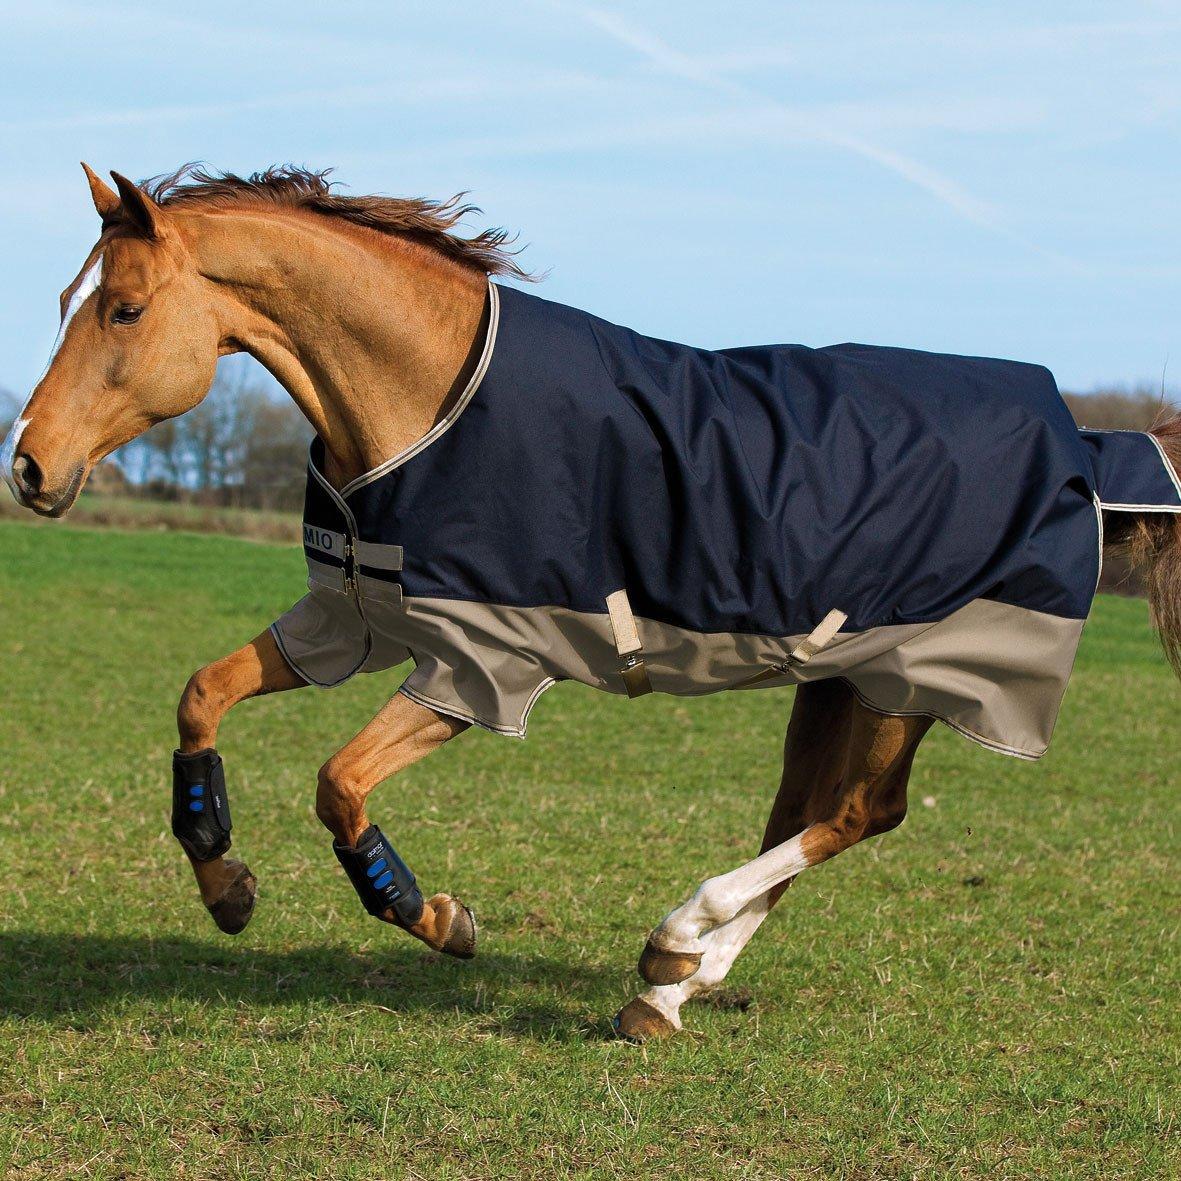 (57, Navy/Tan) - Horseware Amigo Blankets Mio Lite Turnout Sheet 57 Navy/Tan B00IIBYUJU 69|ネイビー/タン ネイビー/タン 69